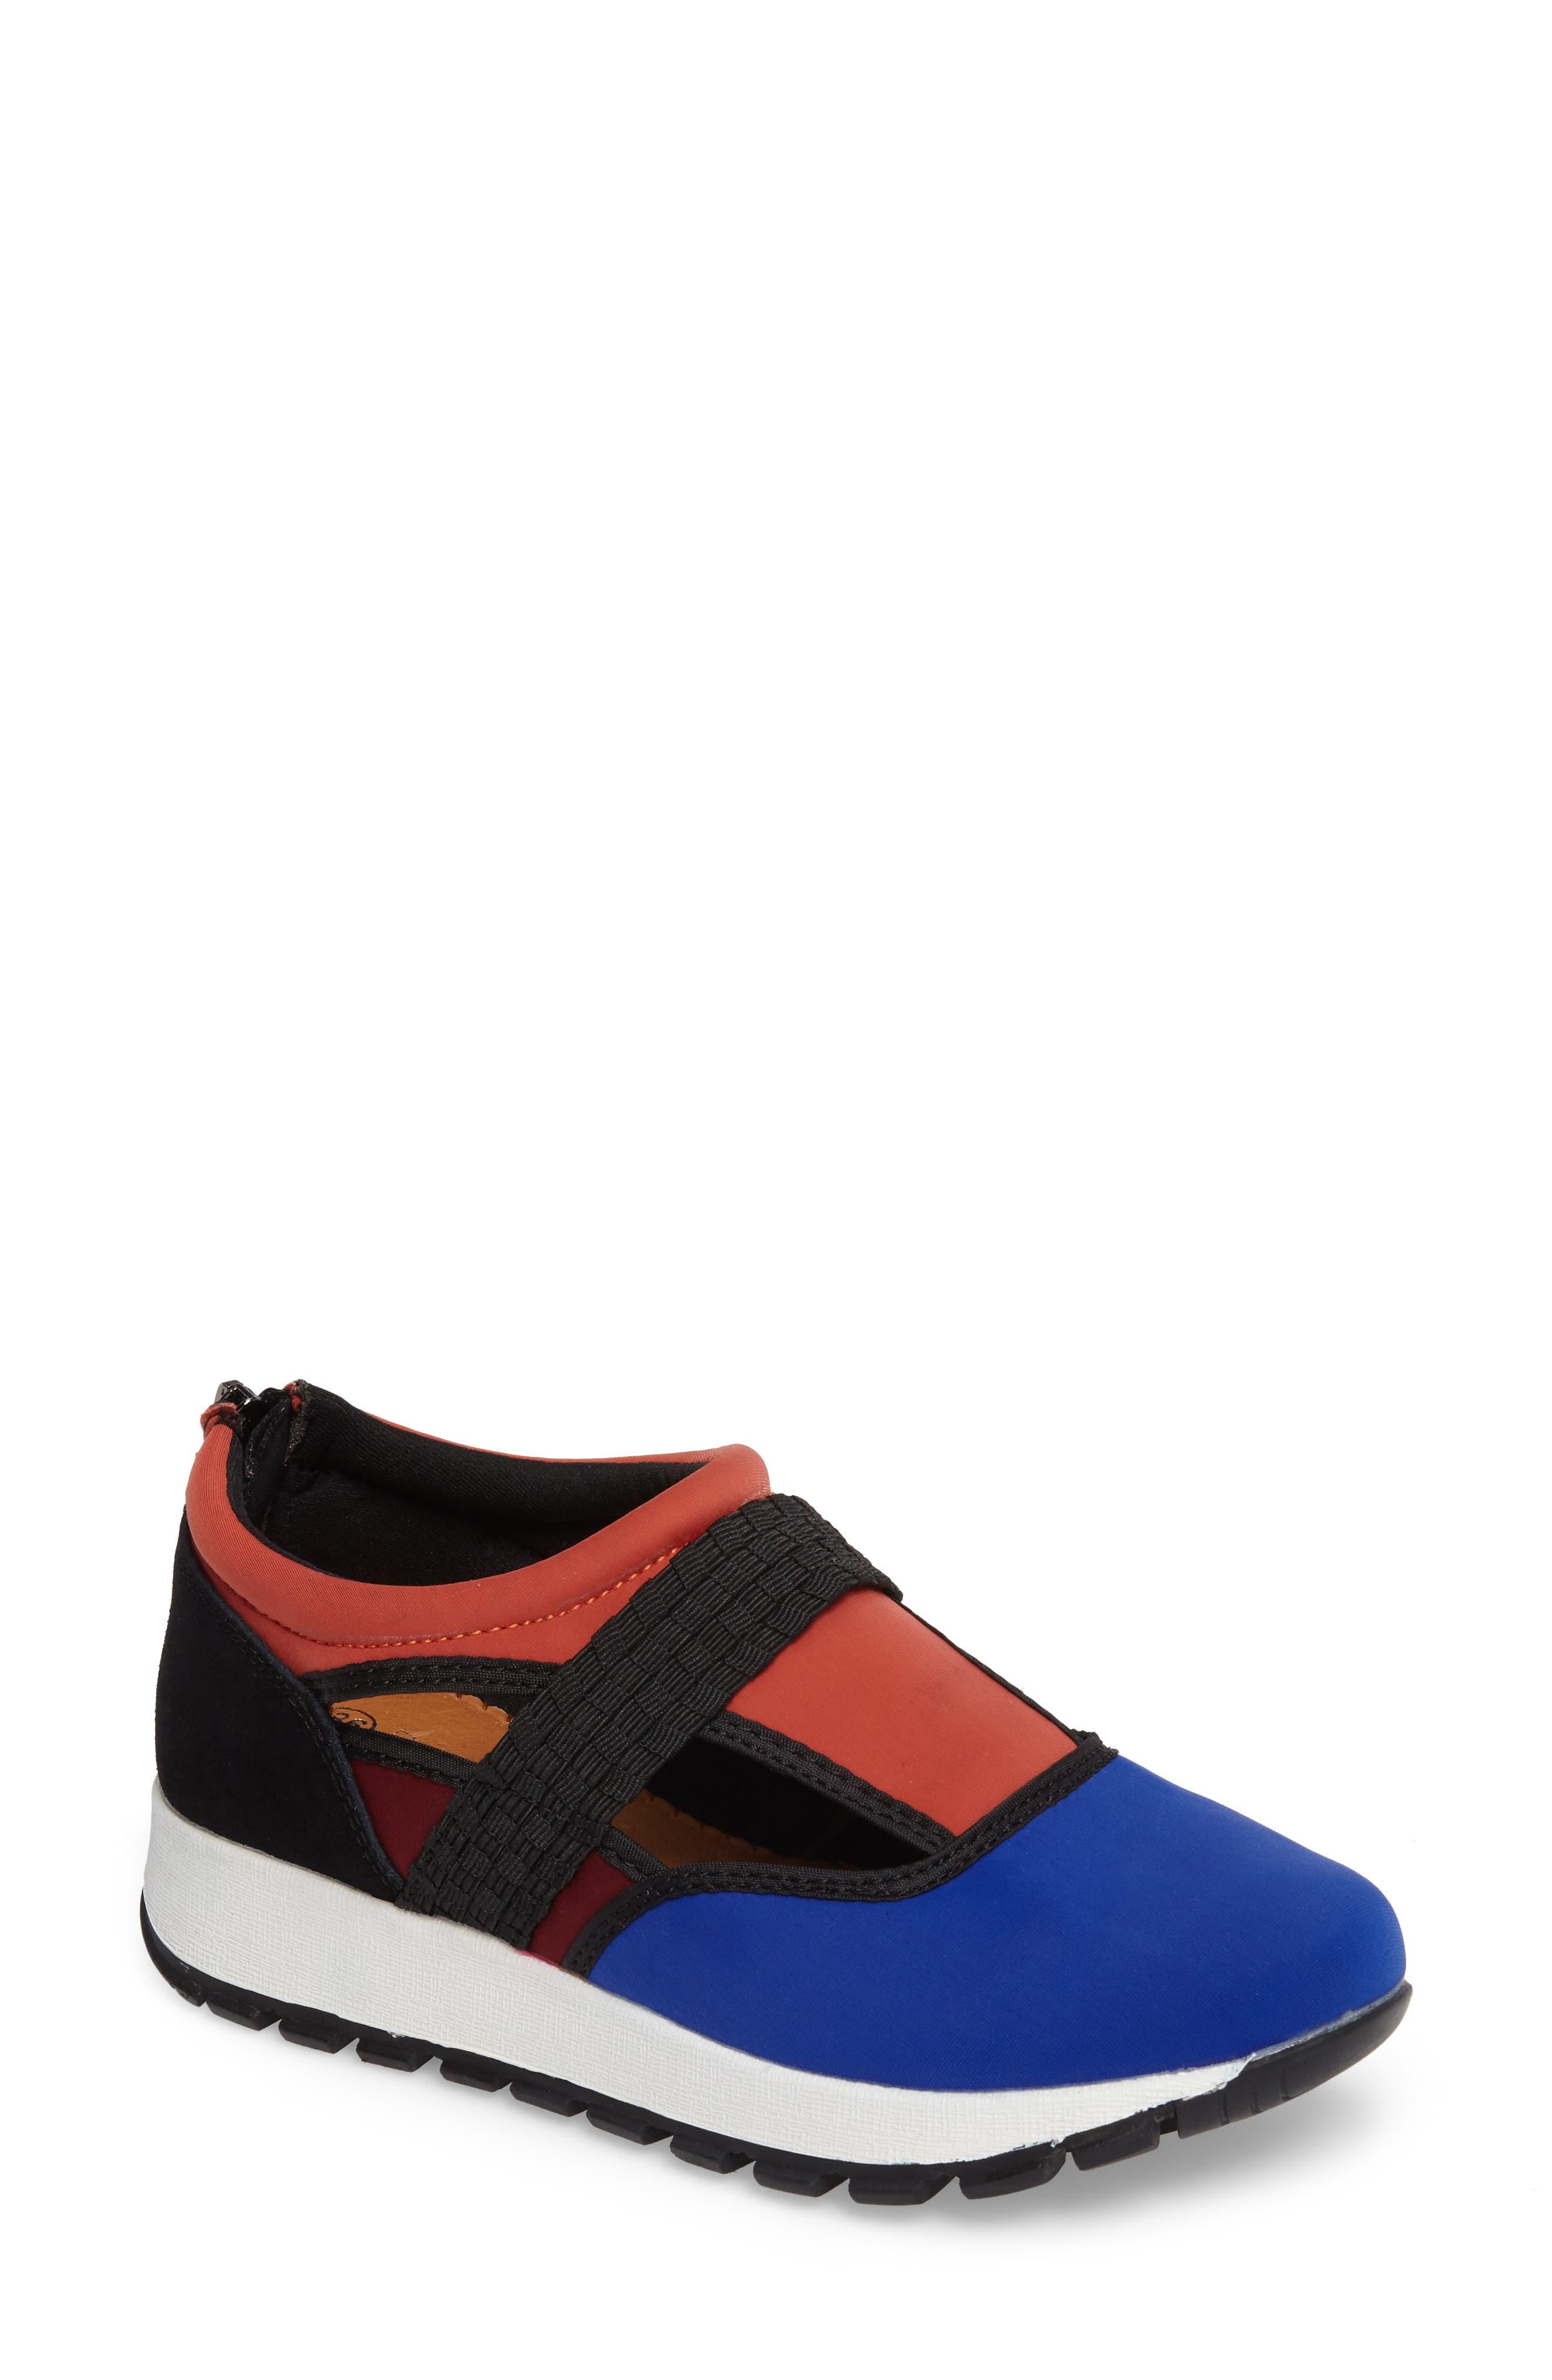 Bernie Mev Janelle Sneaker,                             Main thumbnail 1, color,                             Royal Blue/ Coral Fabric